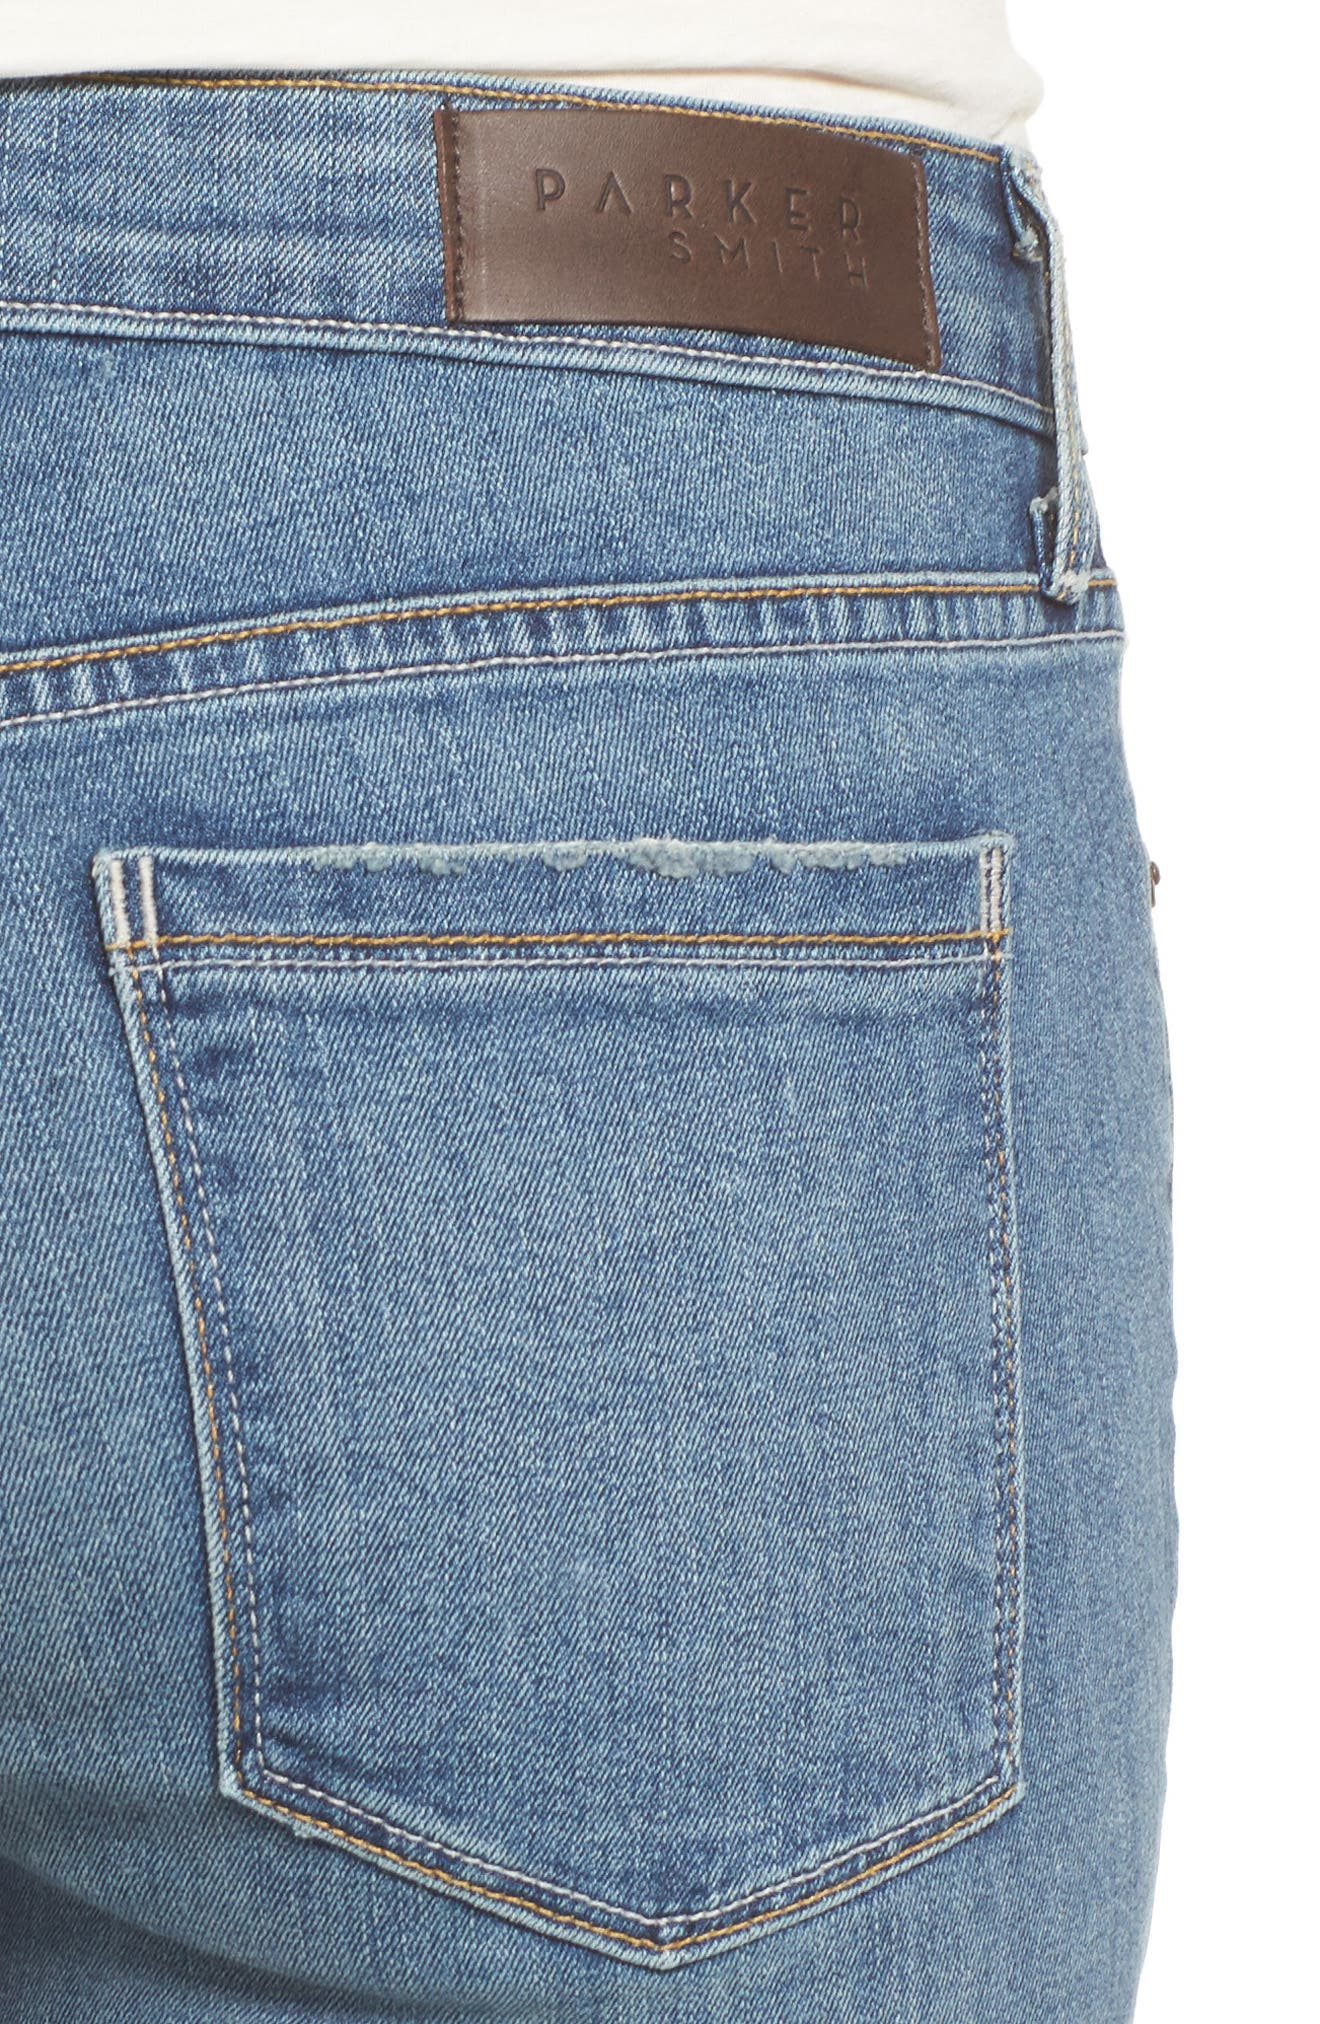 Alternate Image 4  - PARKER SMITH Ava Stretch Skinny Jeans (Liverpool)